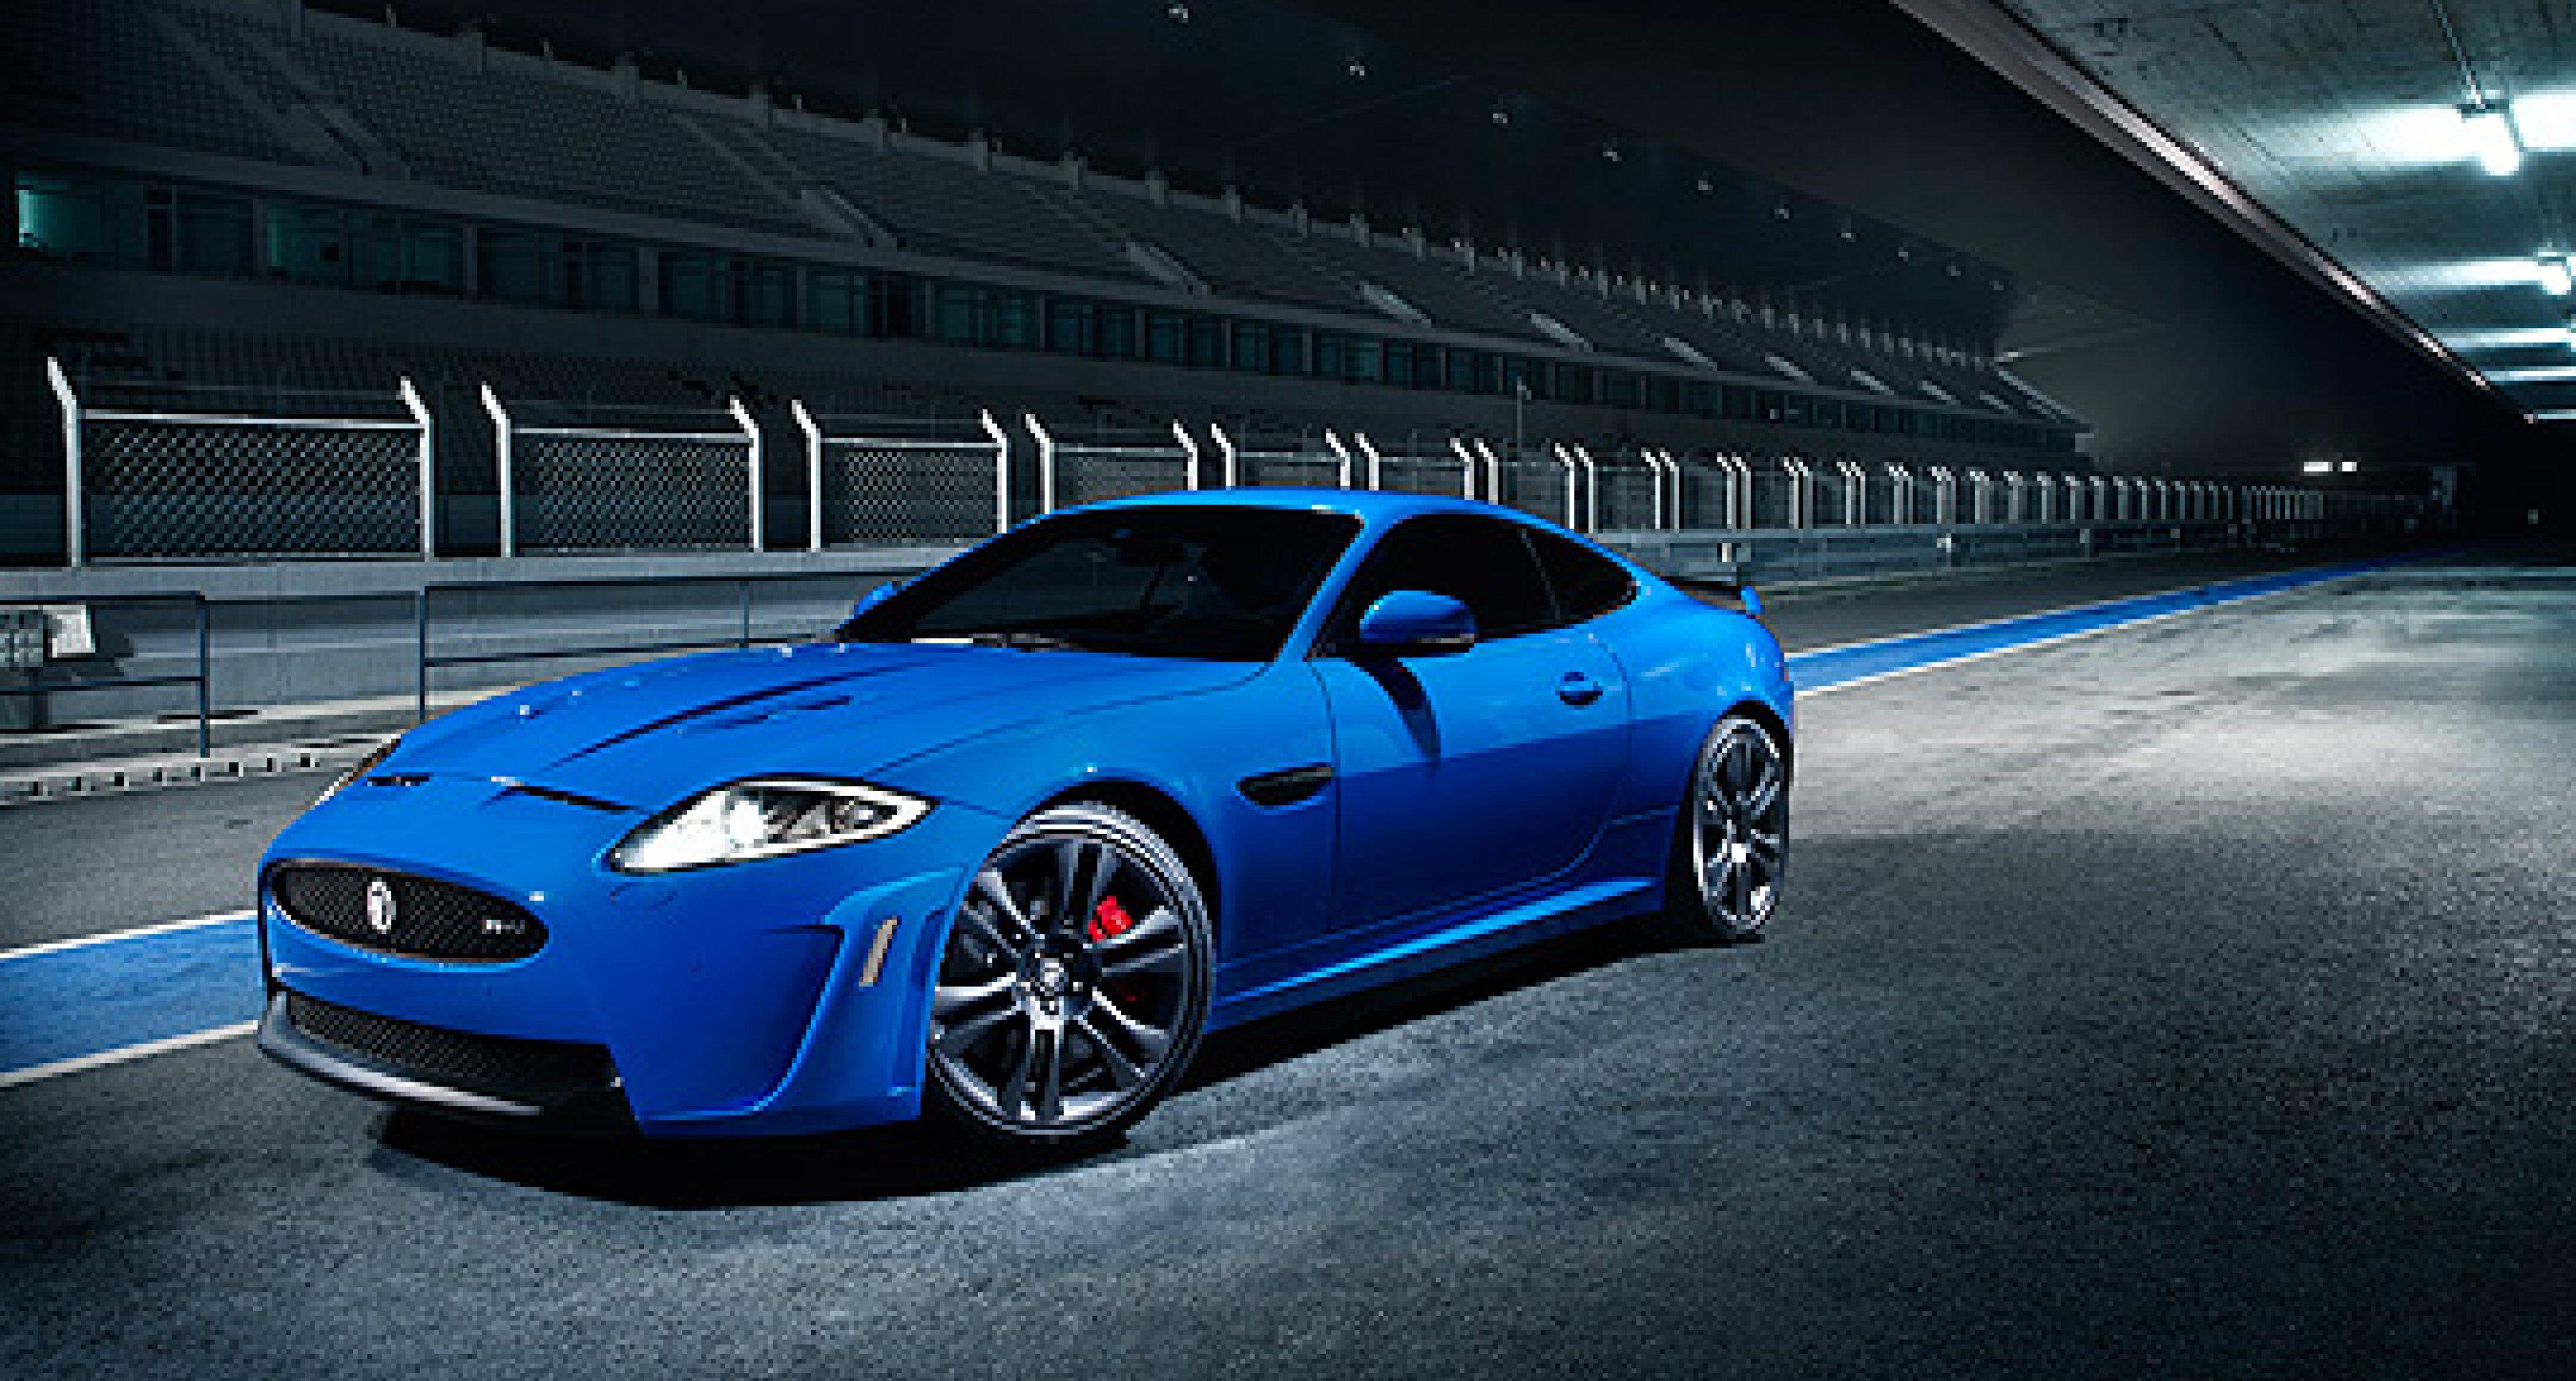 Jaguar XKR-S II: Stärkste Katze im Modellprogramm